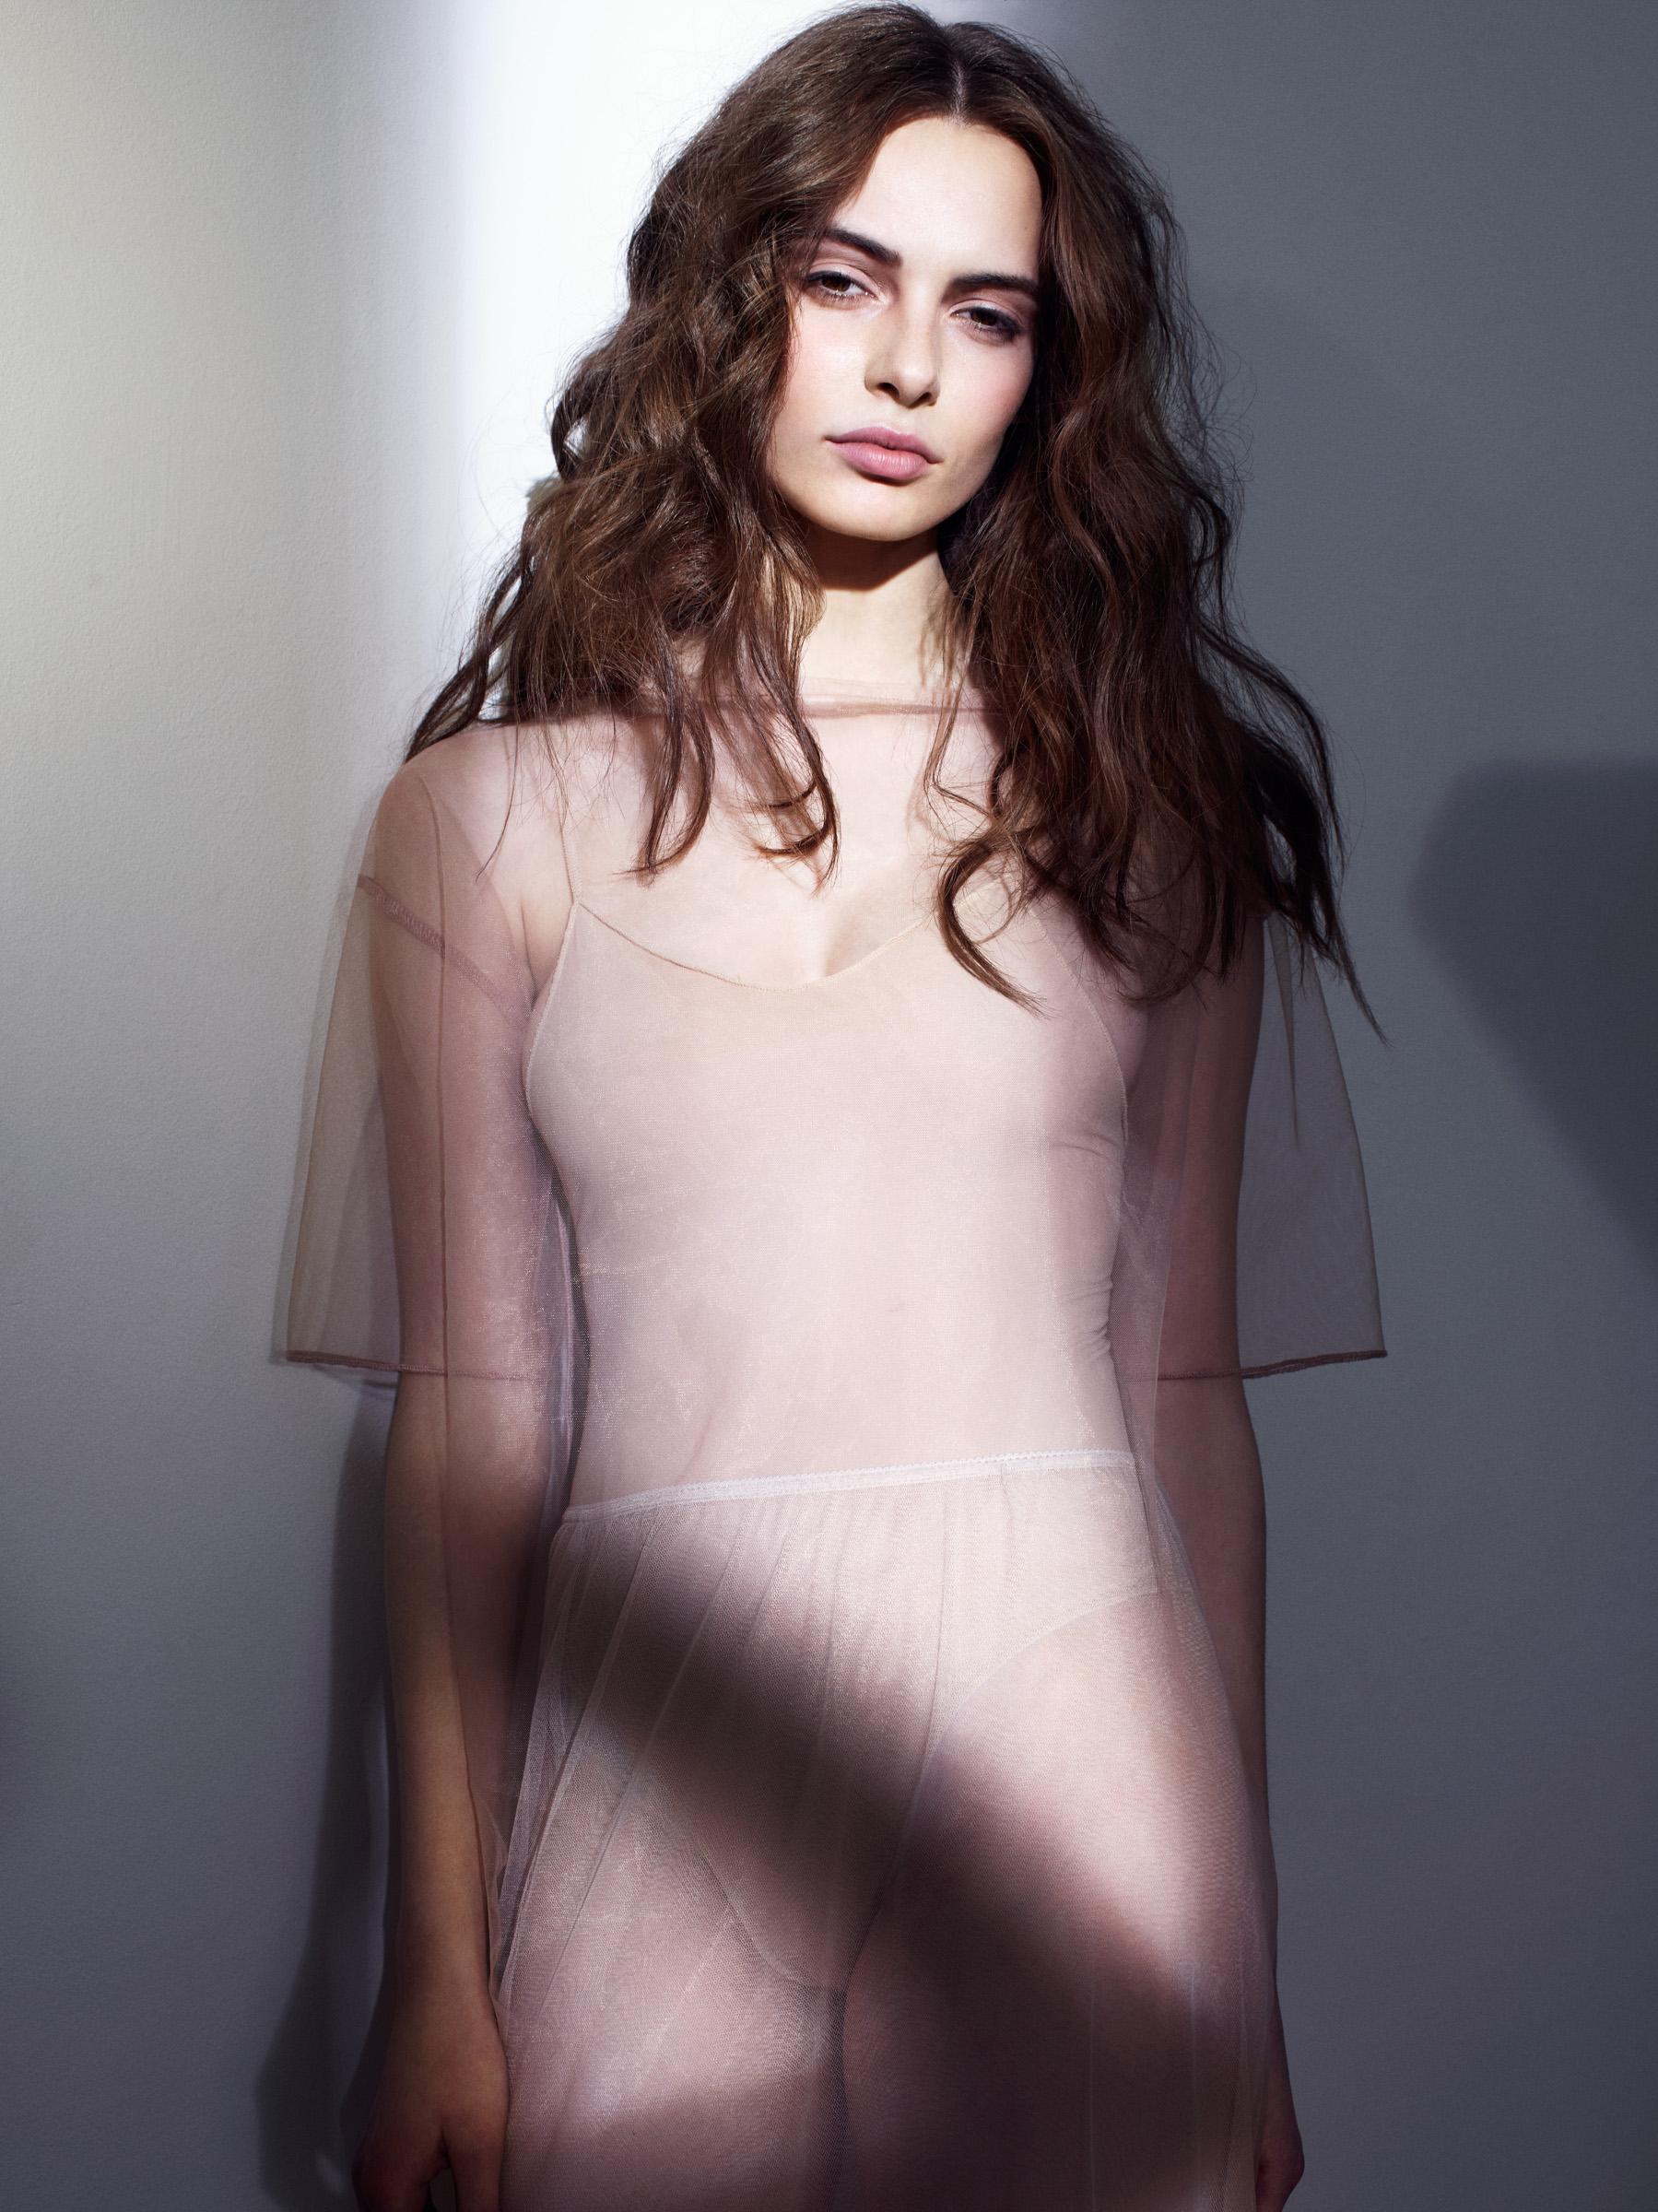 Jack_Eames_Fashion_Light_Shot_04.jpg